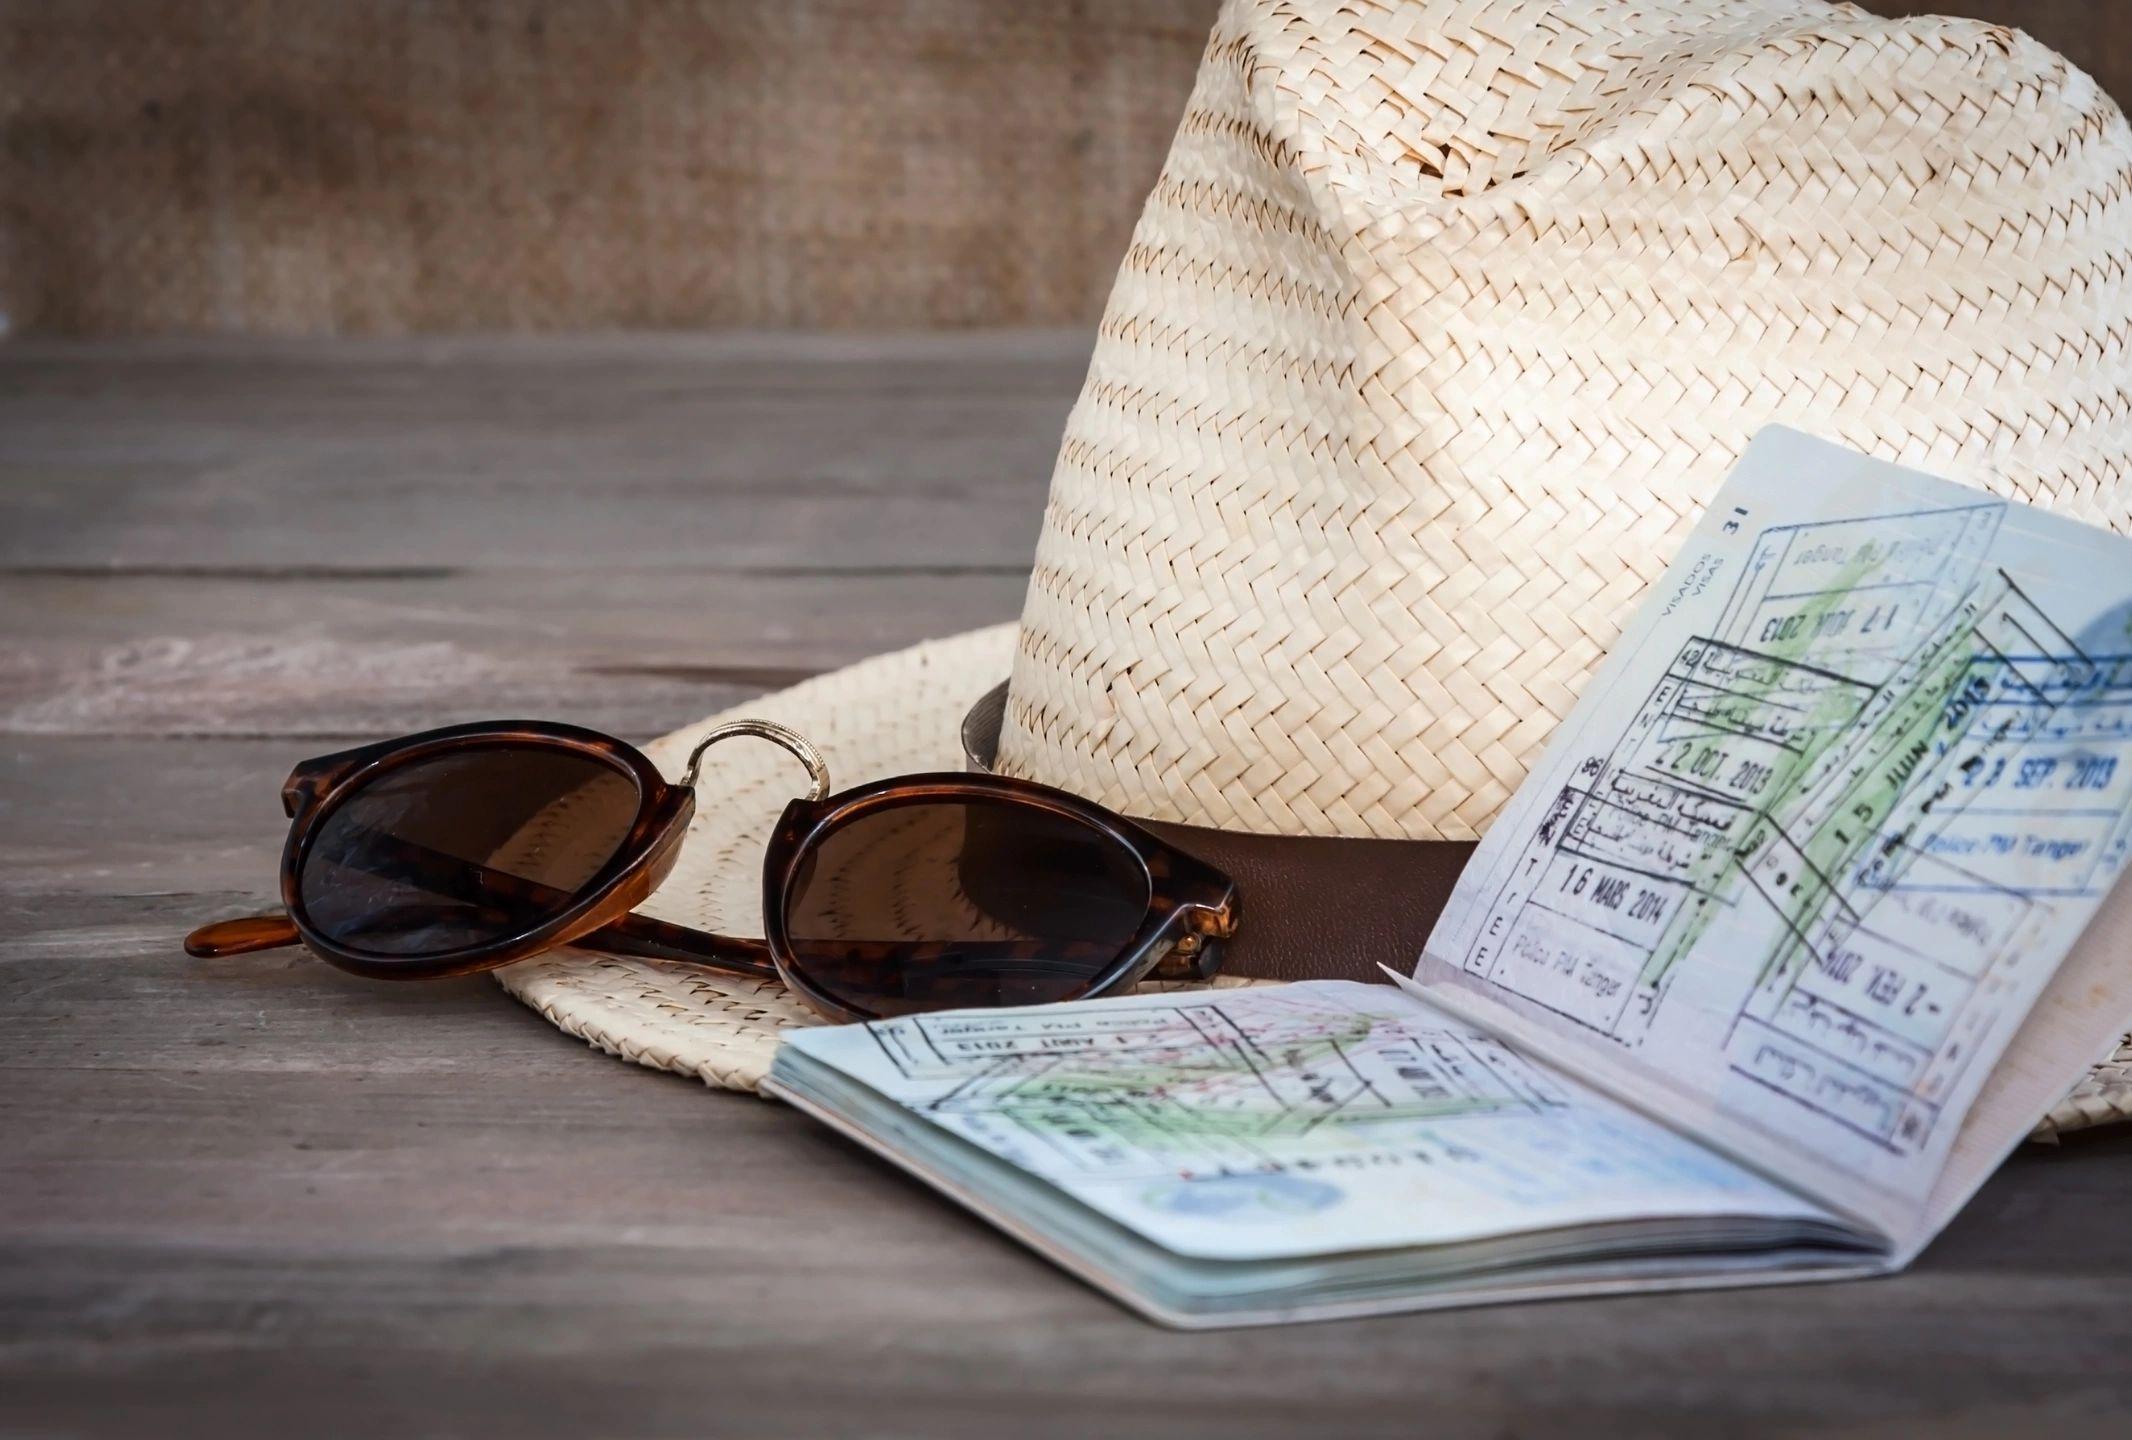 how to get an emergency irish passport in 24 hours